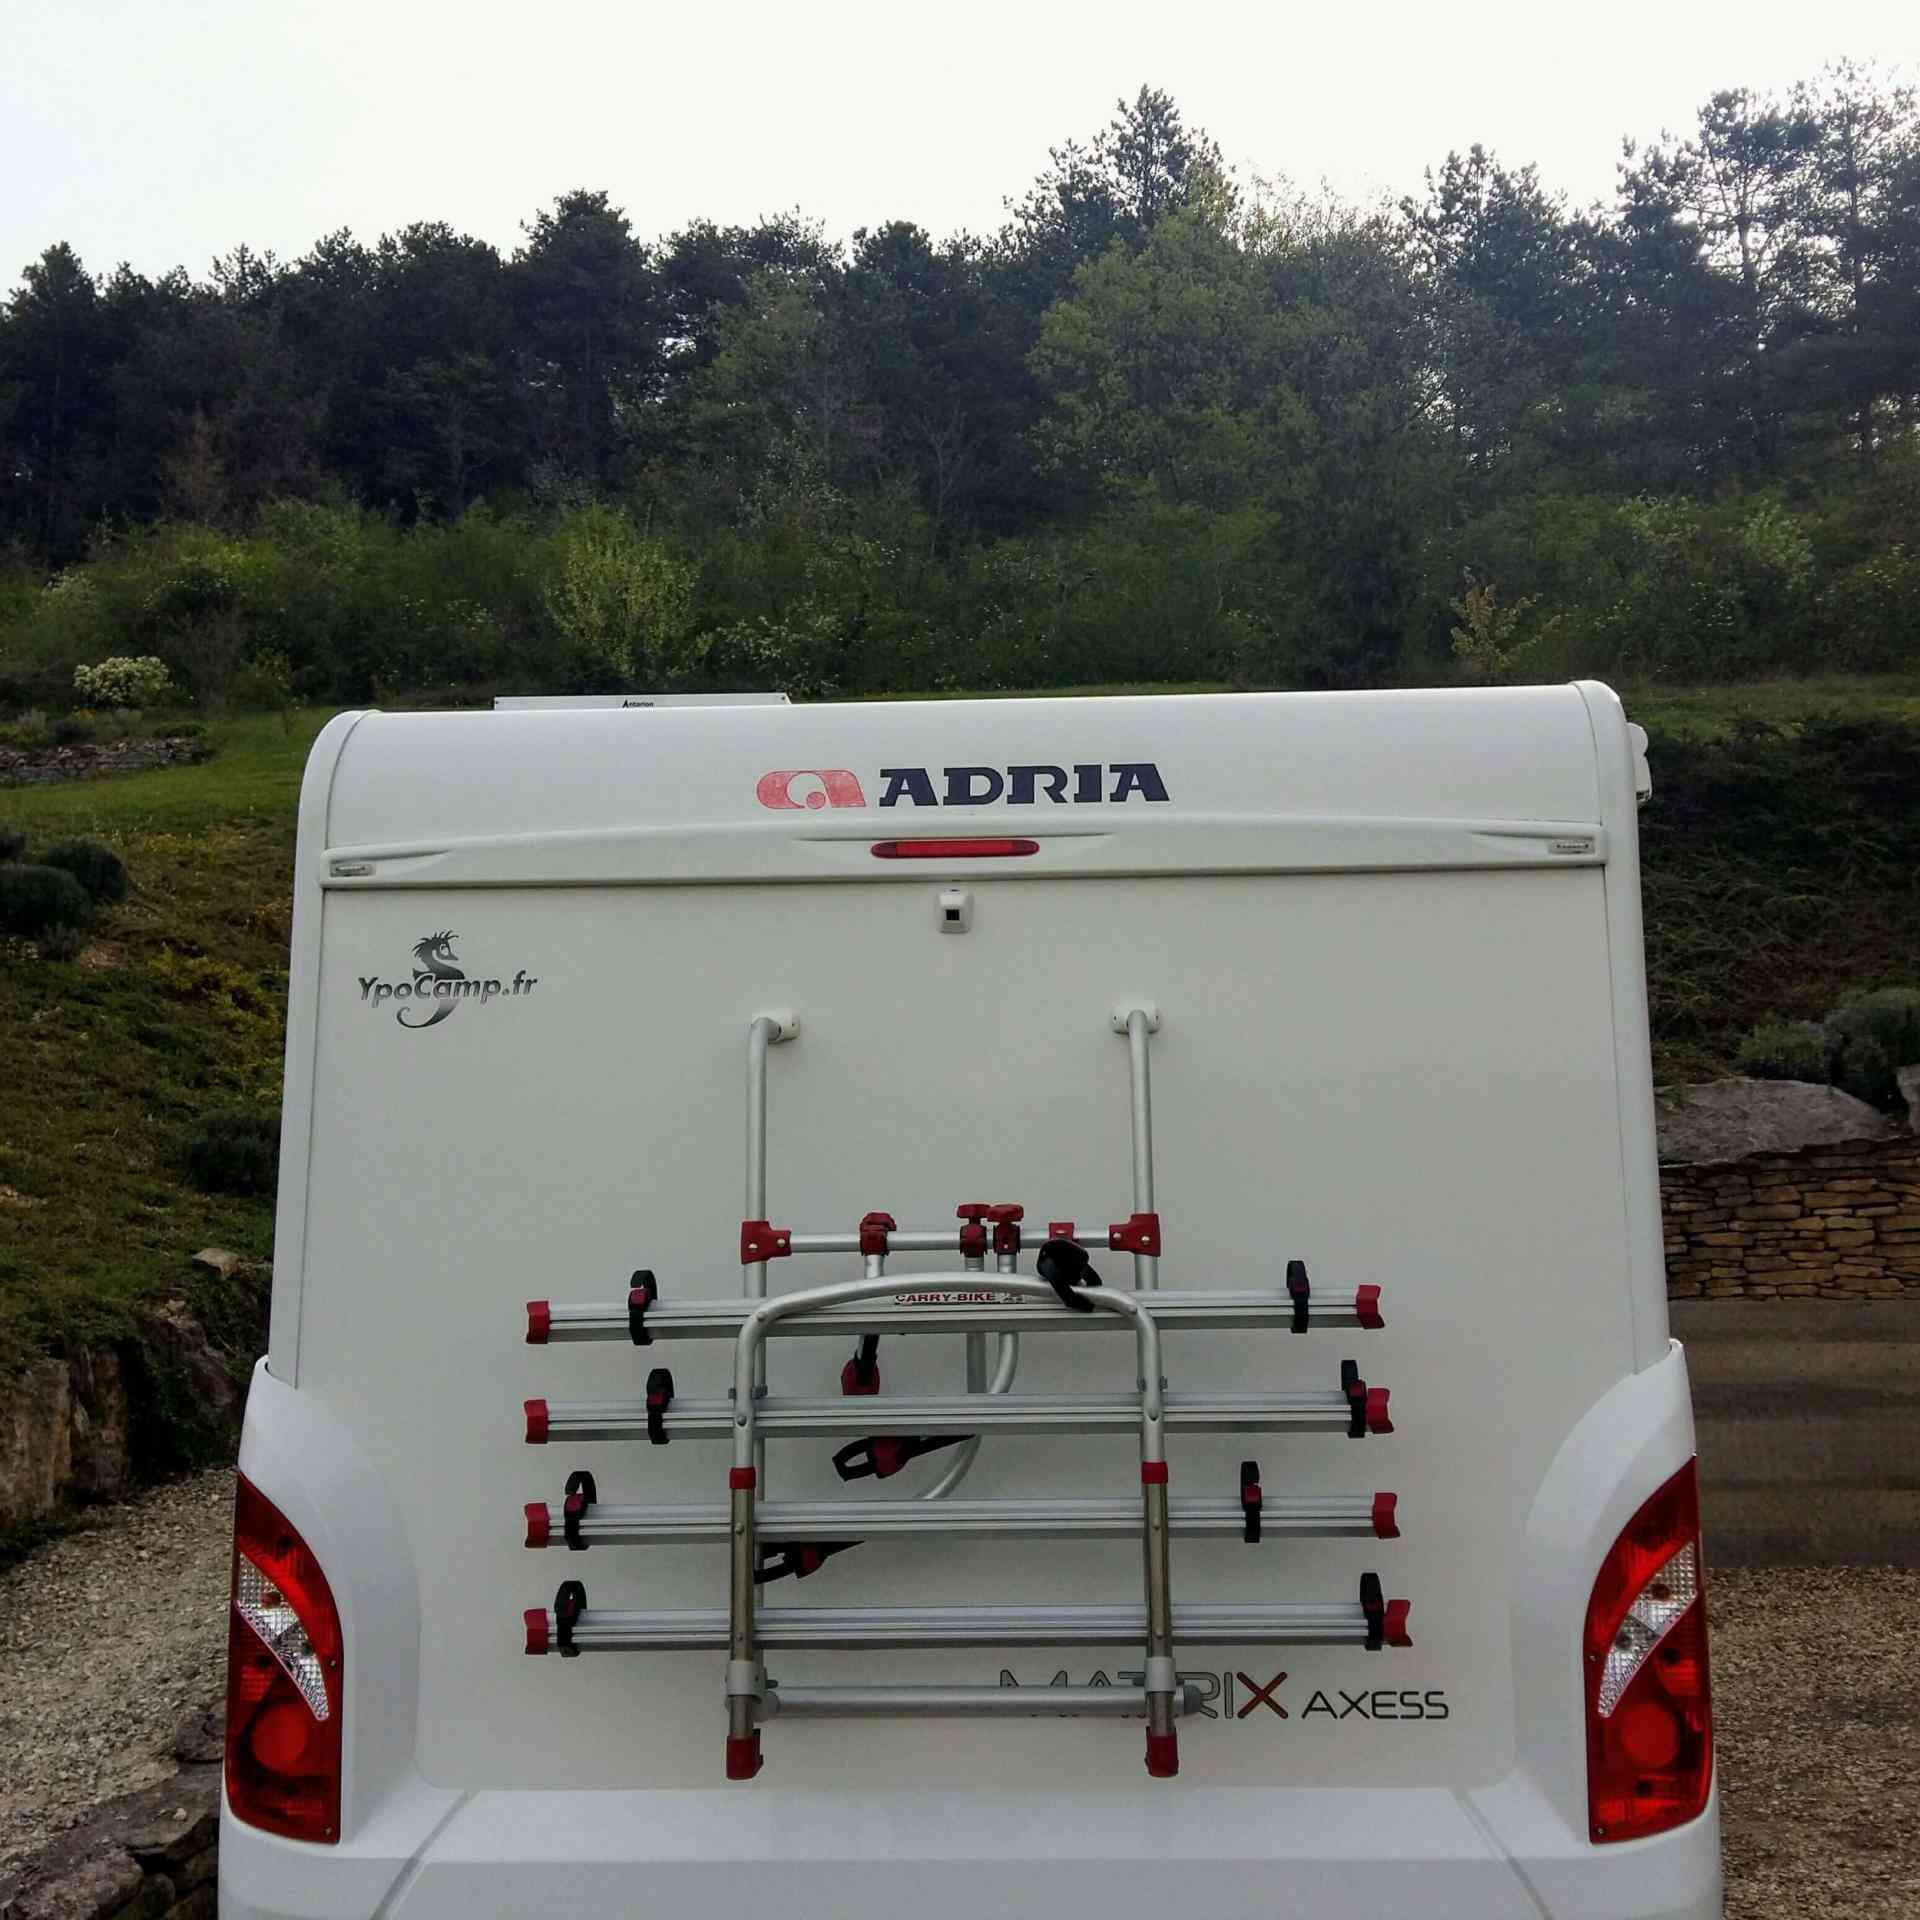 camping-car ADRIA MATRIX AXESS